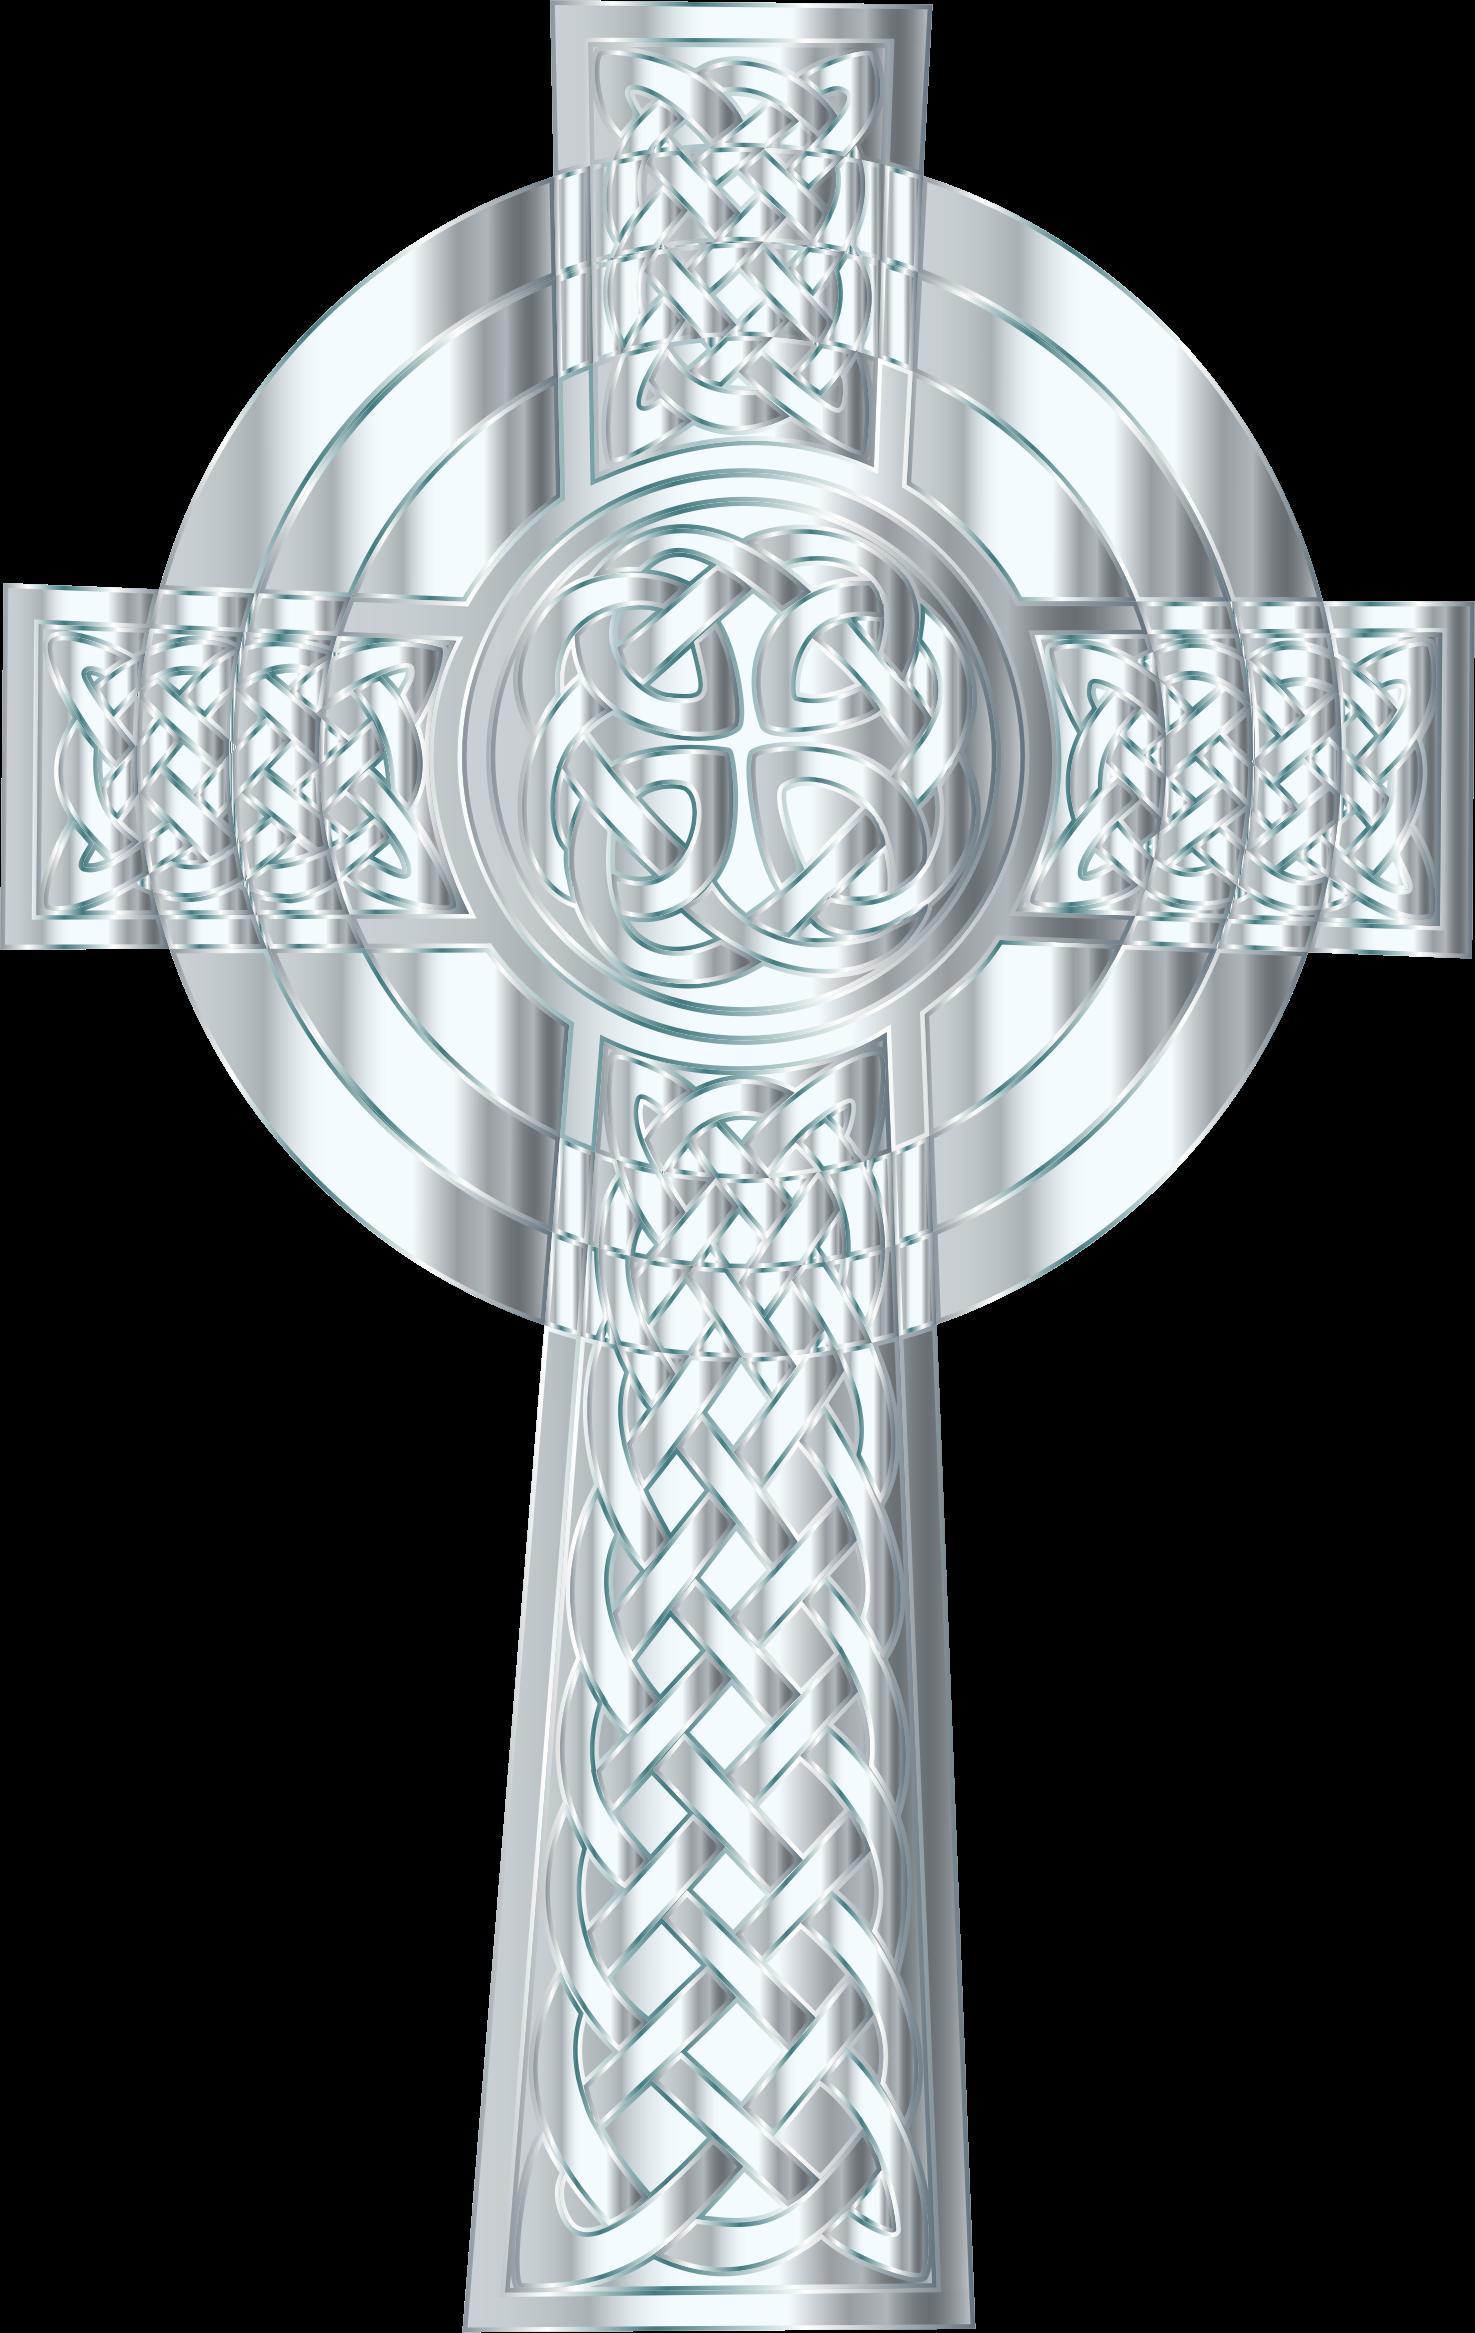 Crucifix clipart ornate cross. Silver celtic big image